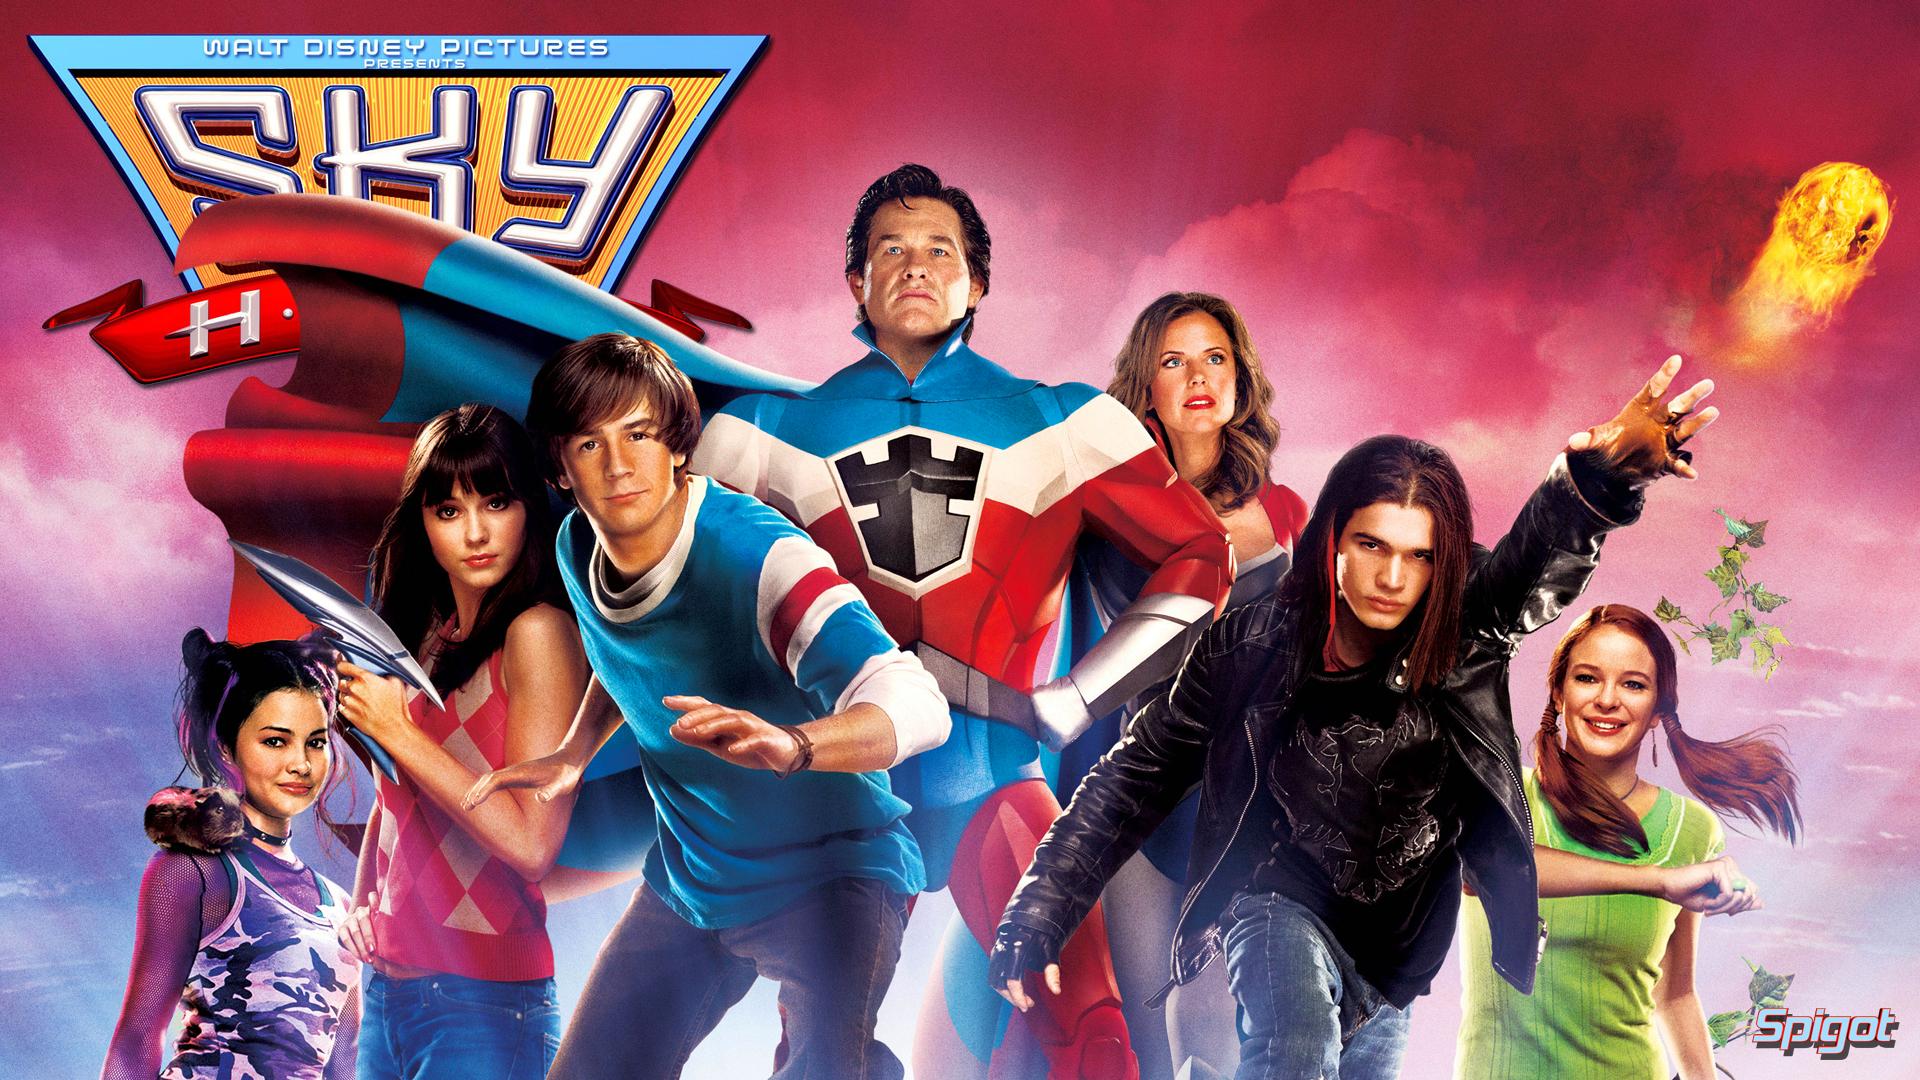 Sky High: A Superhero Movie Ahead of Its Time | Den of Geek